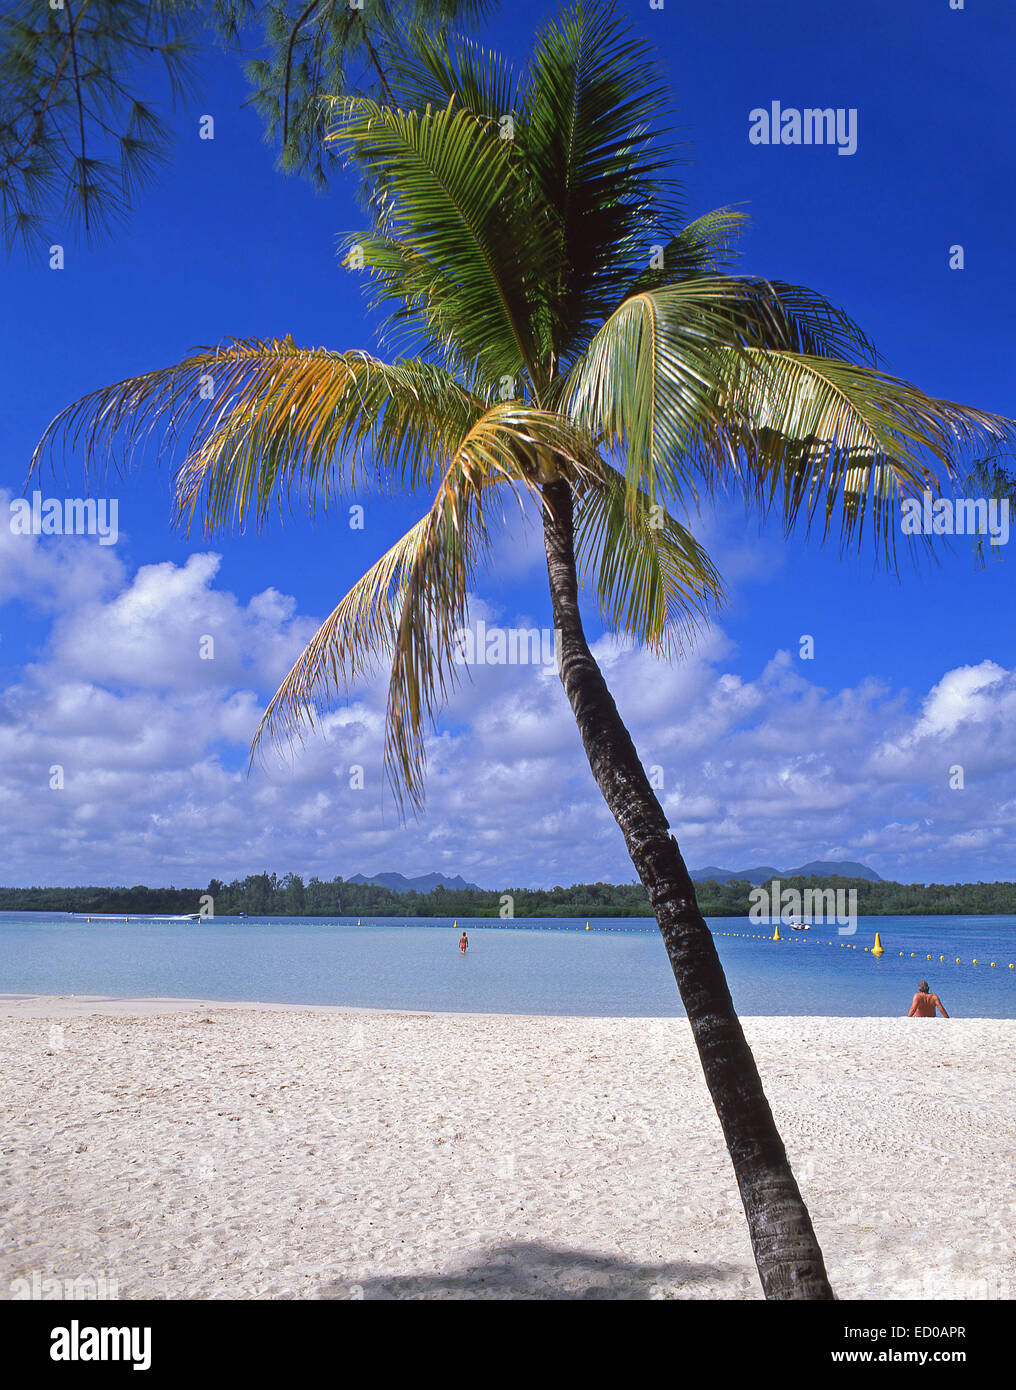 Tropical beach, Île aux Cerfs Island, Flacq District, Republic of Mauritius - Stock Image